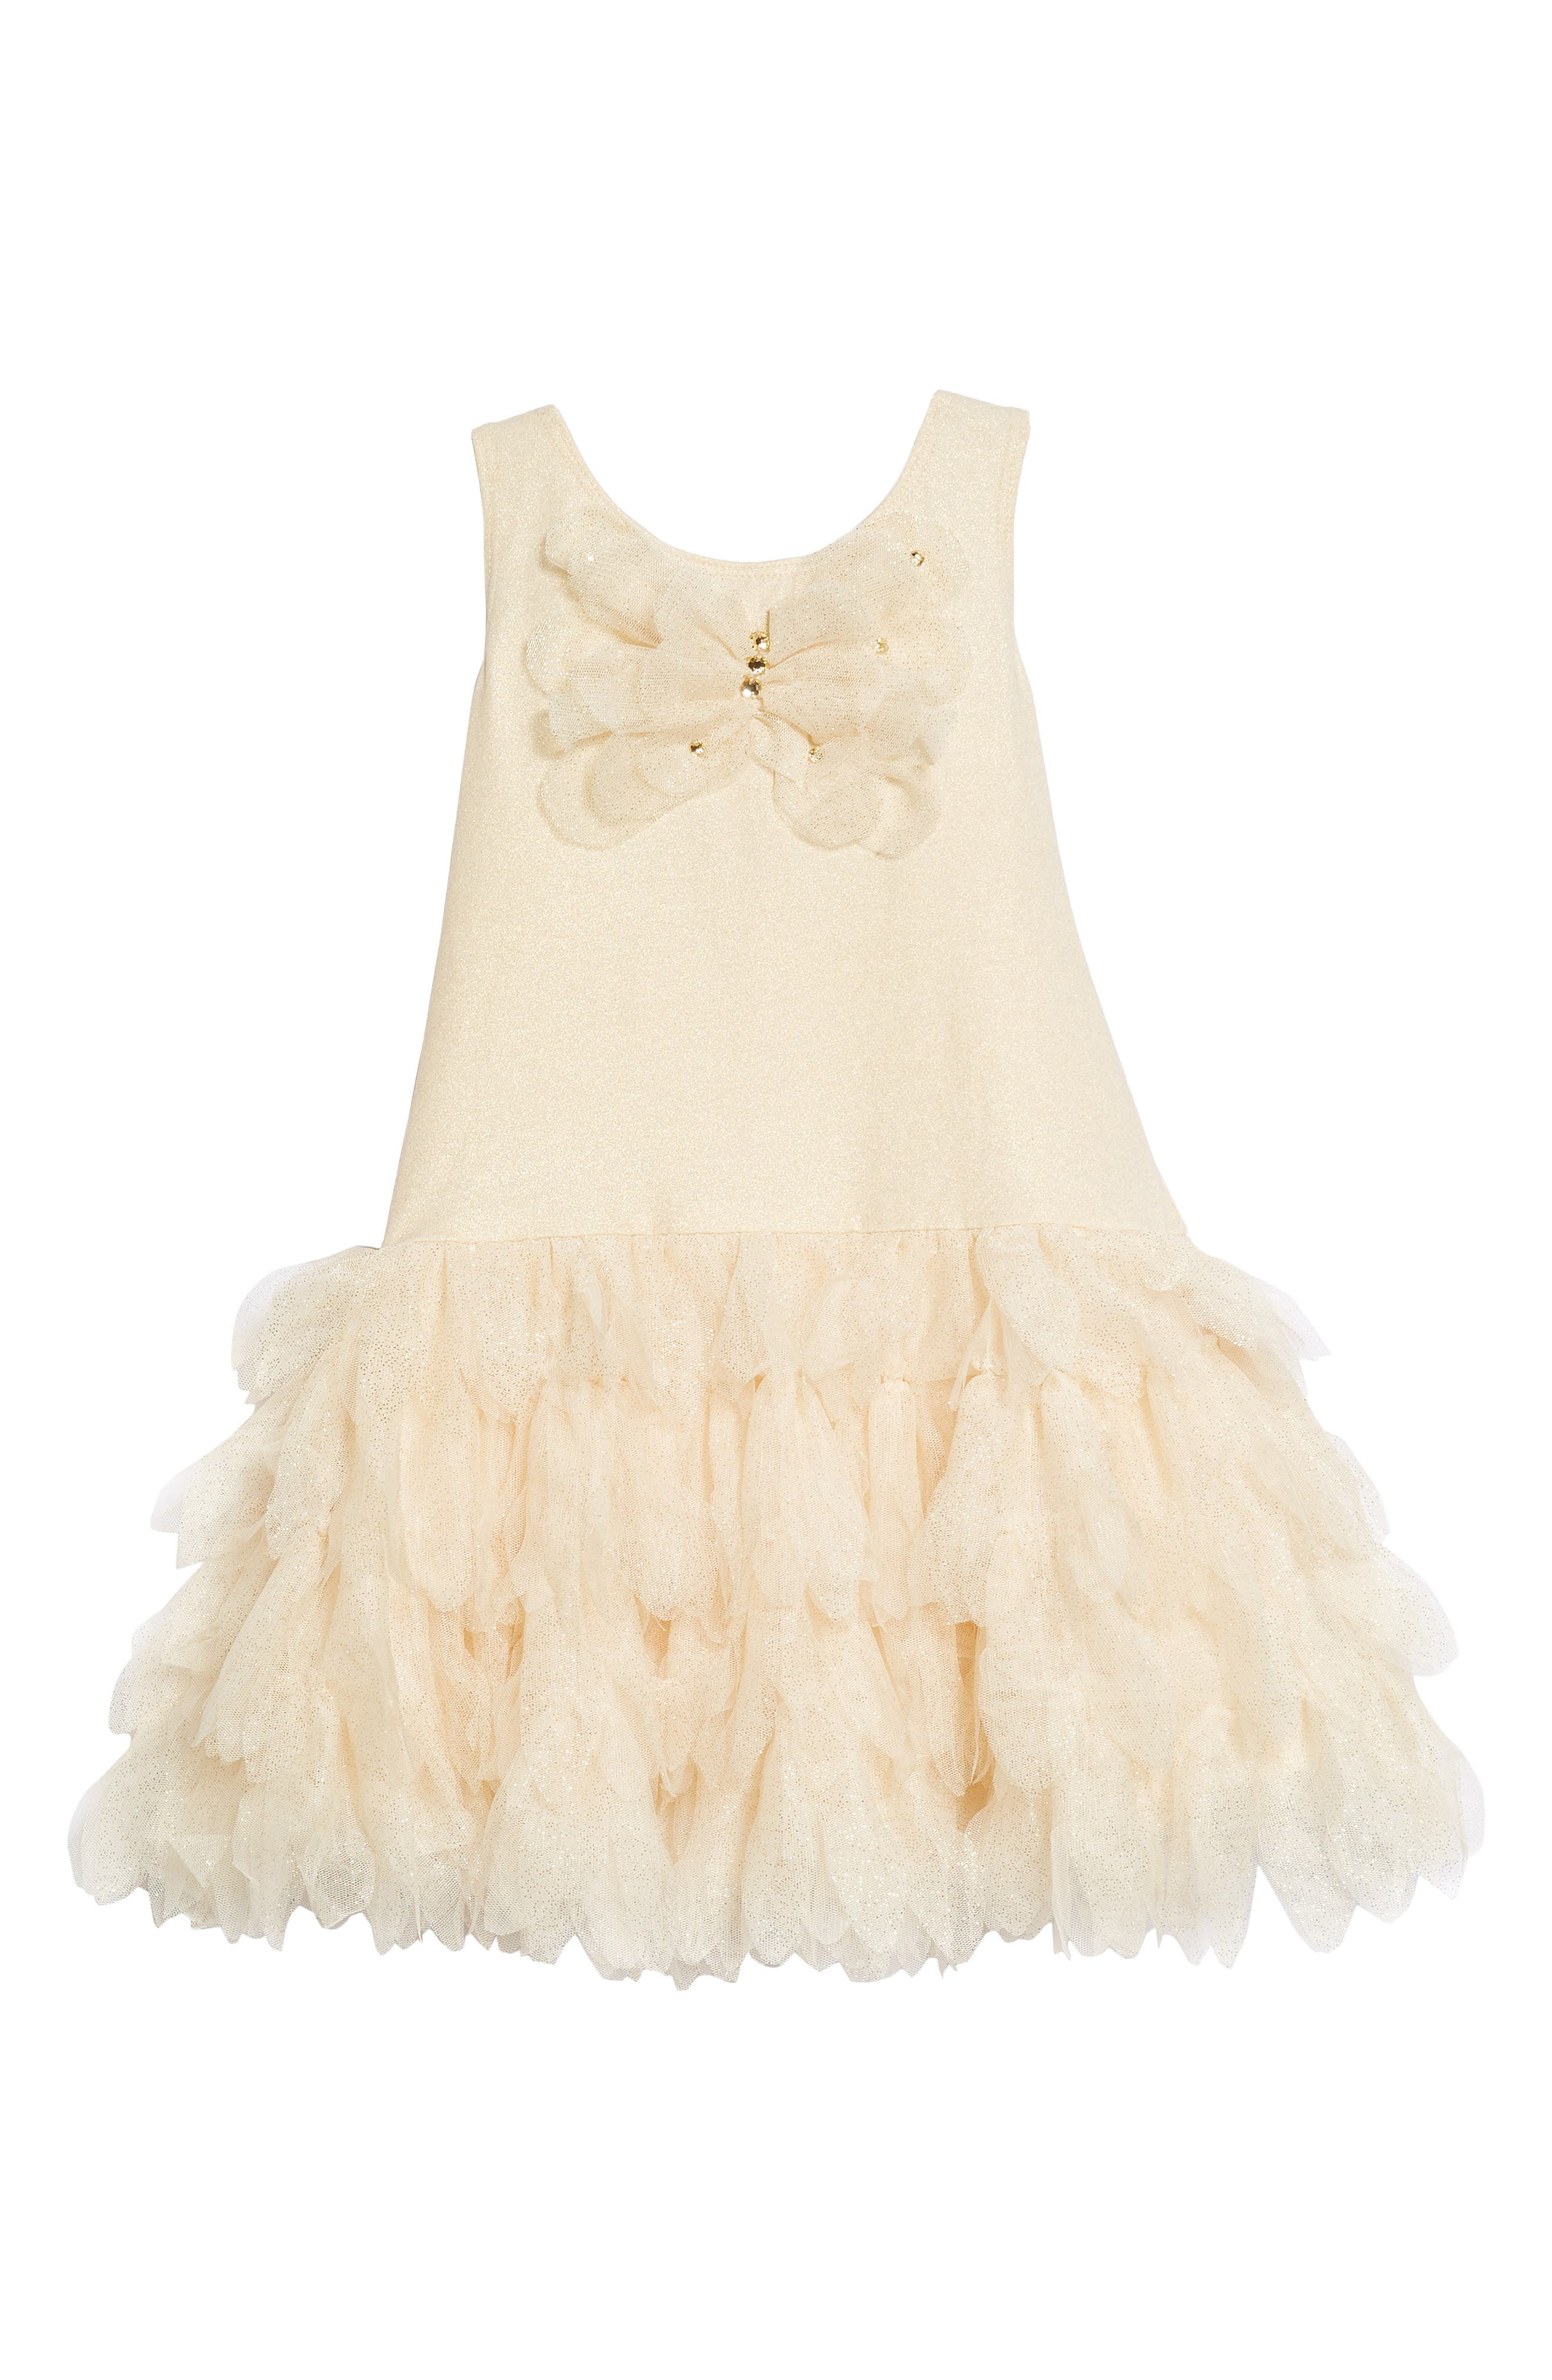 Sleeveless Tulle Dress,                             Main thumbnail 1, color,                             710